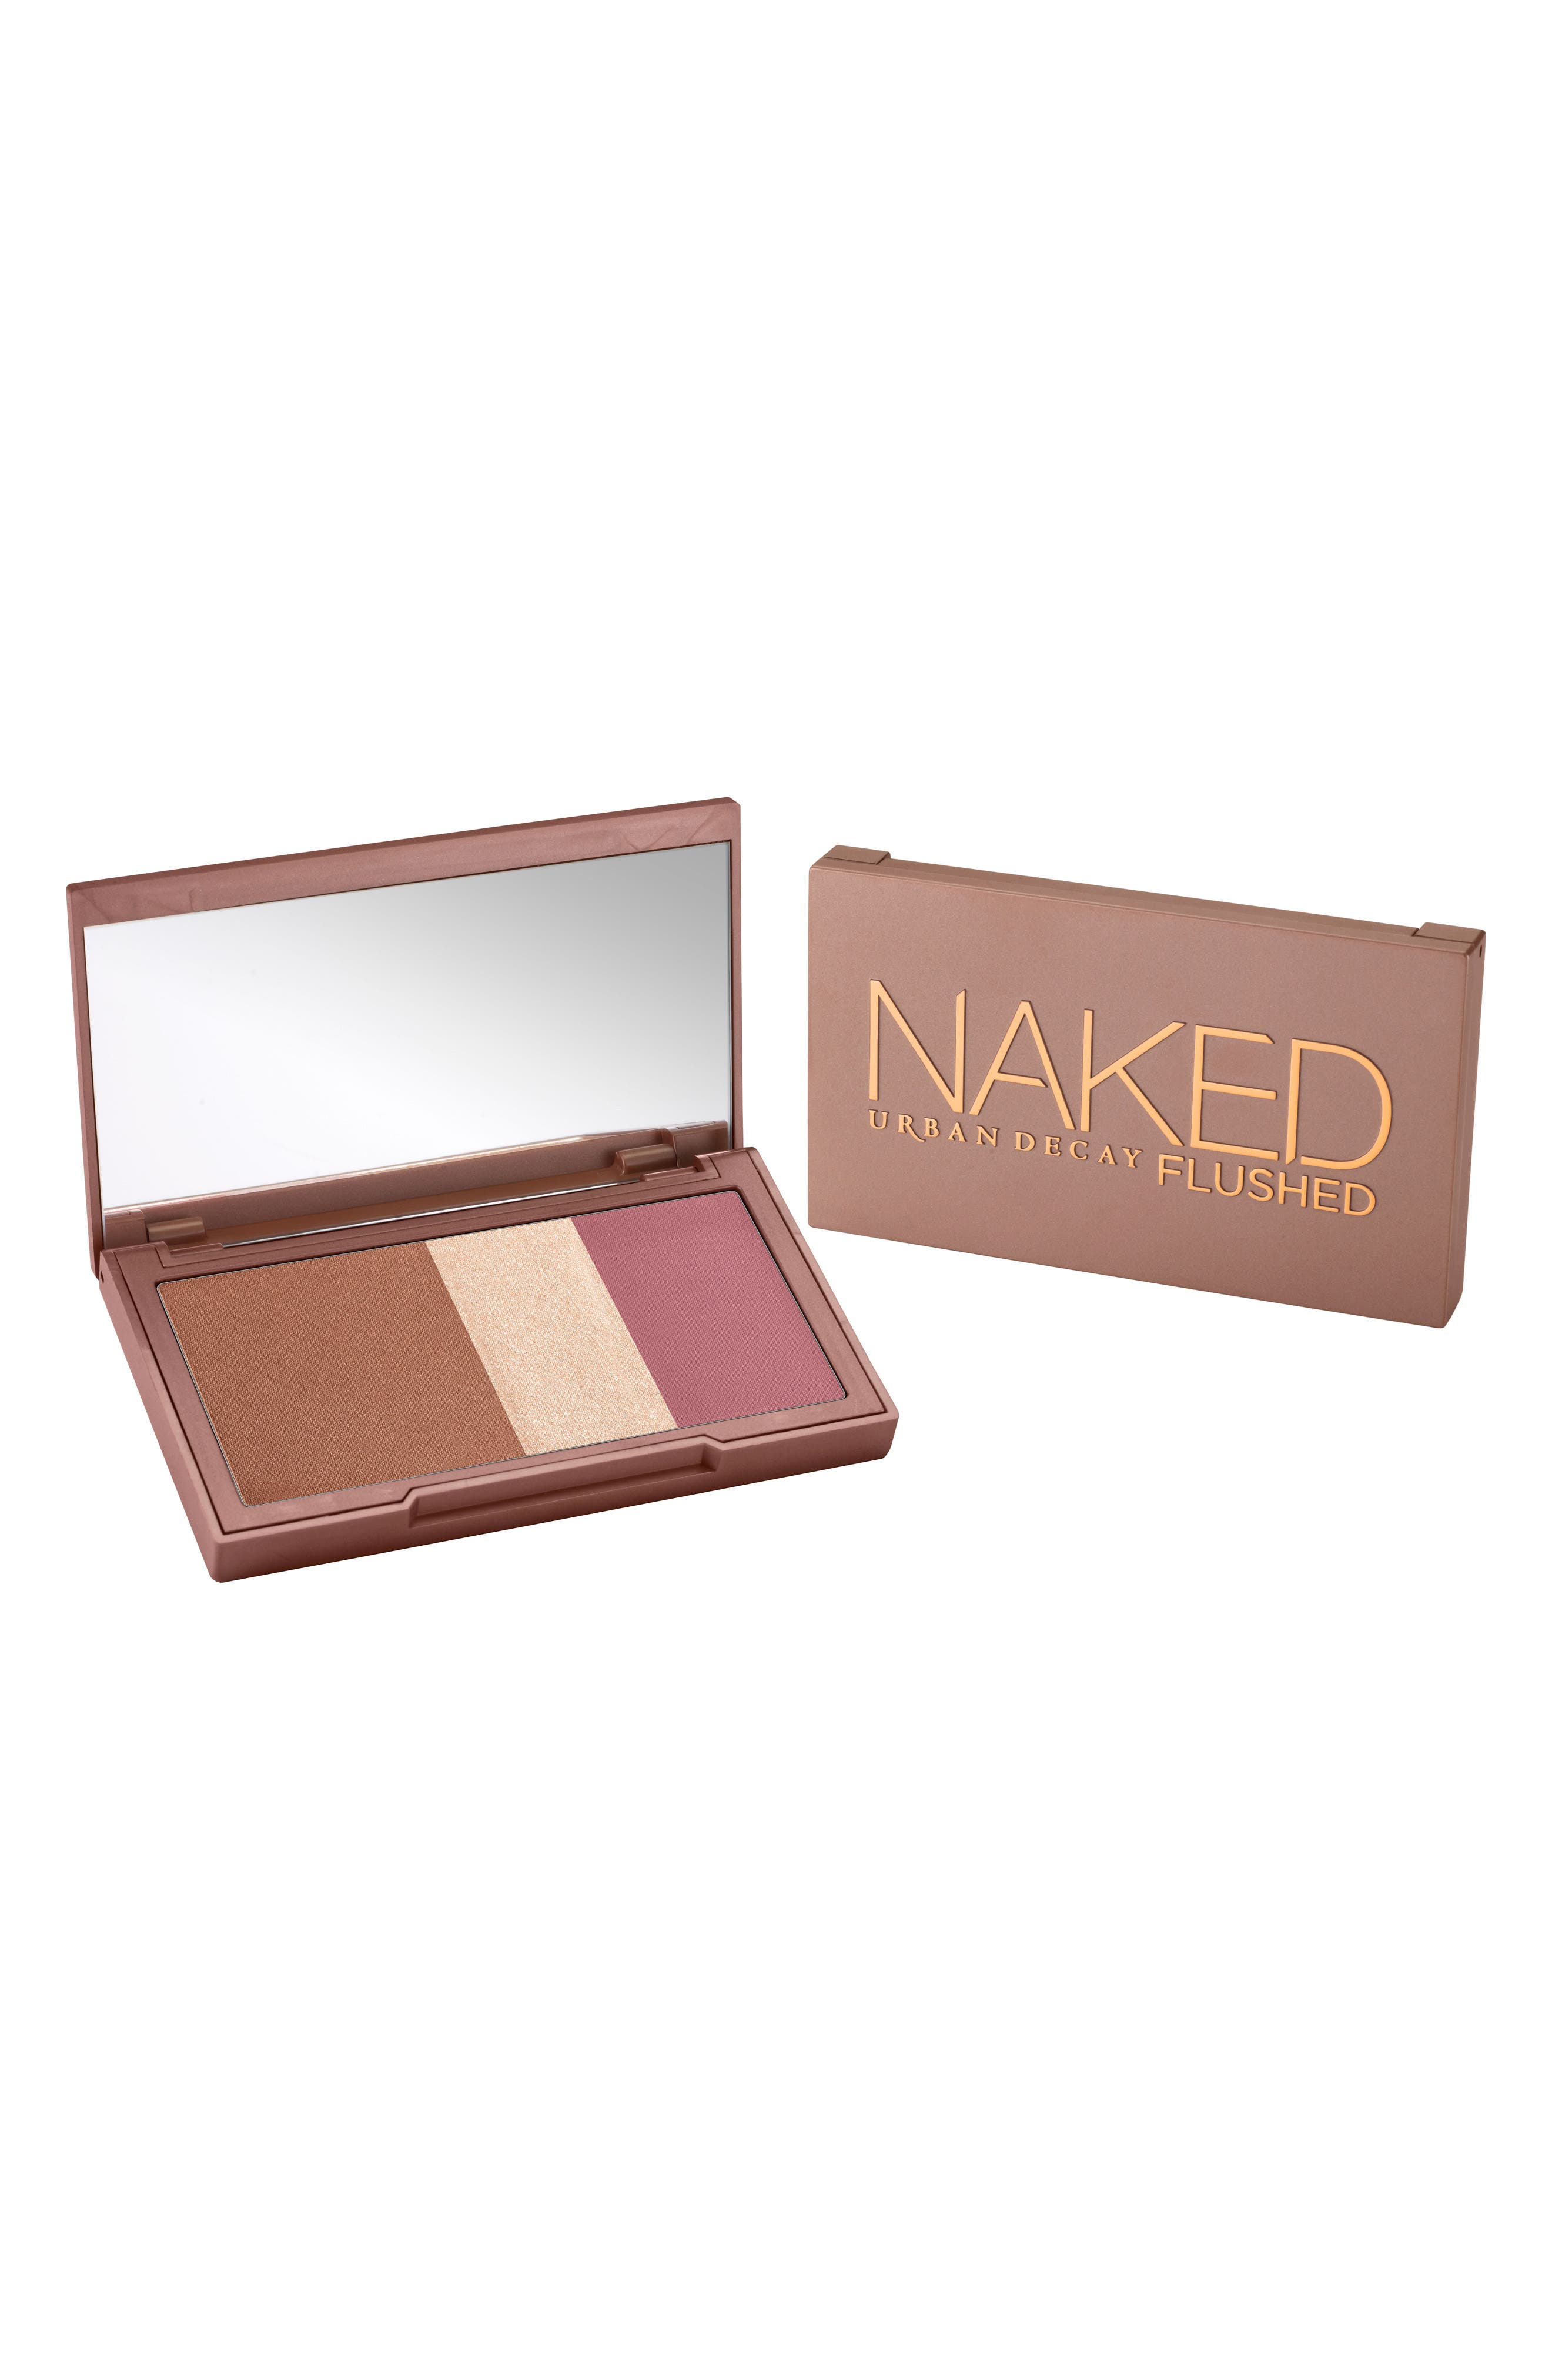 Naked Flushed Bronzer, Highlighter & Blush Palette,                             Alternate thumbnail 2, color,                             SESSO